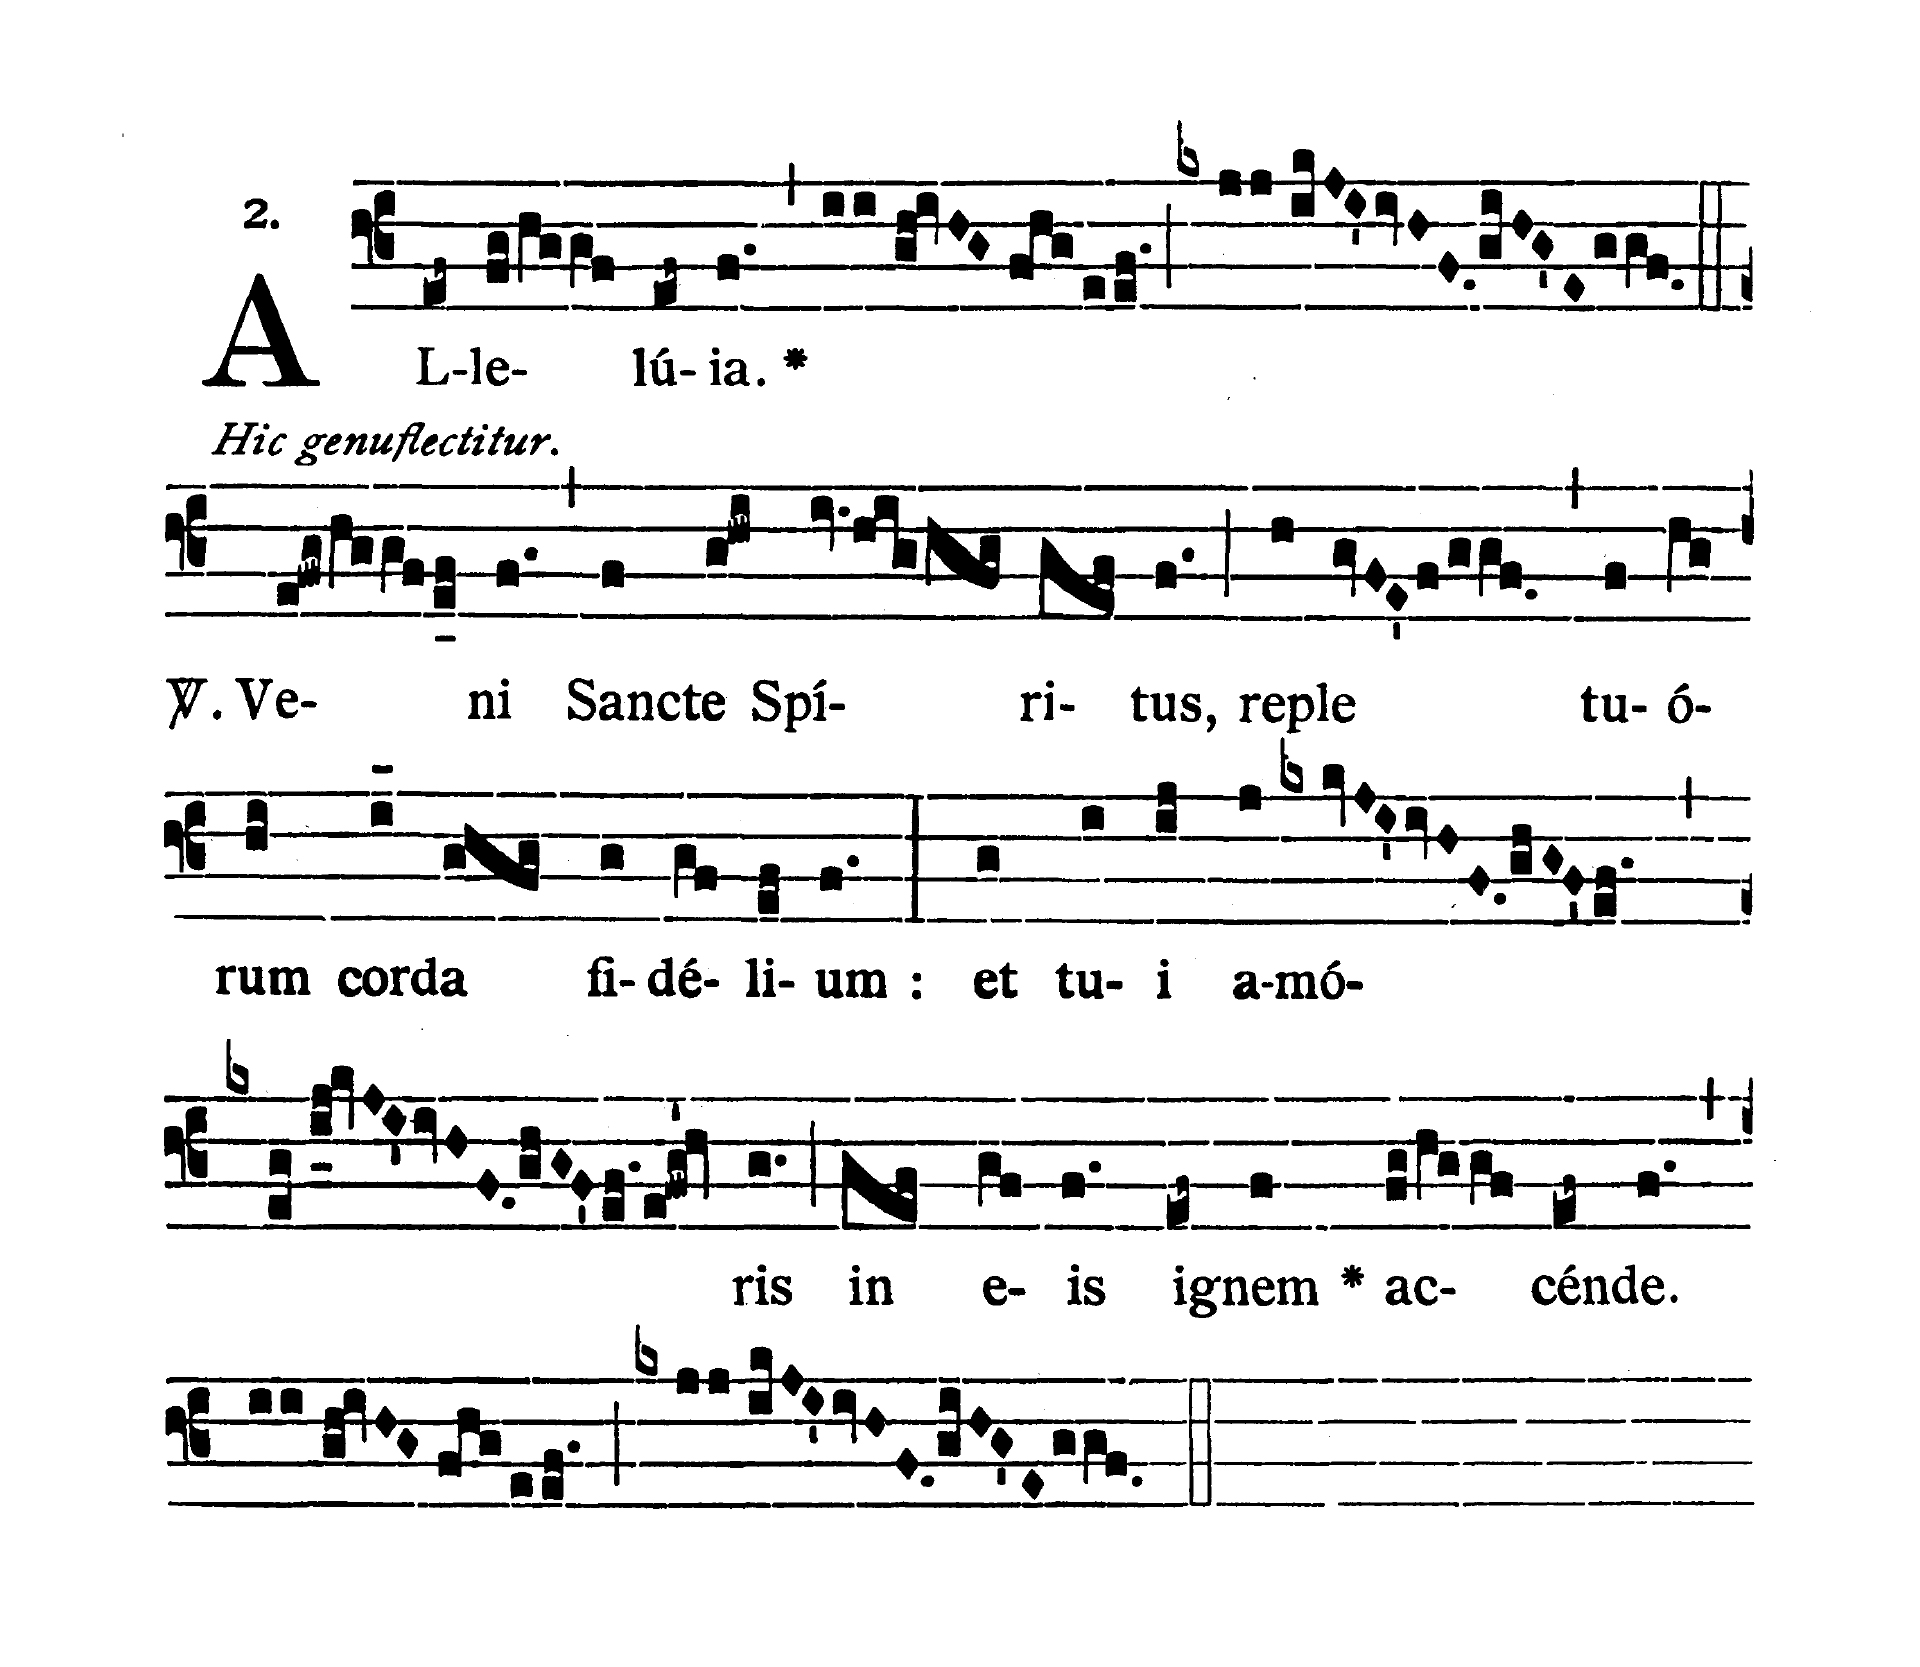 Feria secunda infra Octavam Pentecostes (Poniedziałek w oktawie Zesłania Ducha Świętego) - Alleluia secunda (Veni Sancte Spiritus)